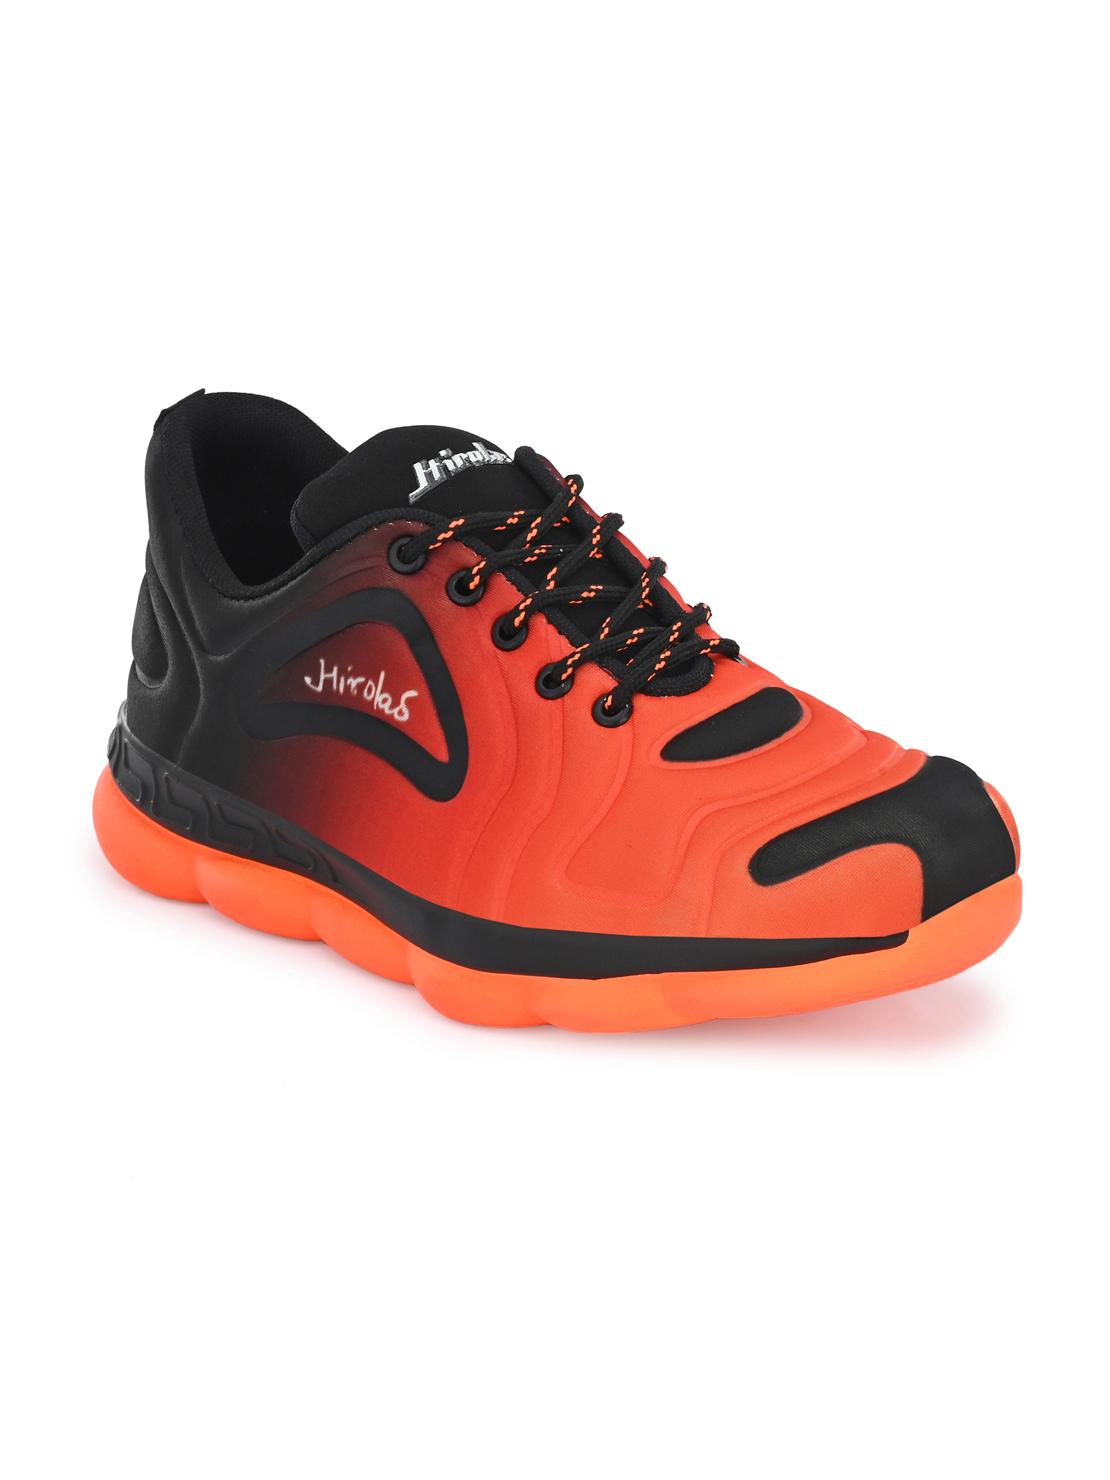 Hirolas   Hirolas® Men's Fabric Orange Running/Walking/Gym Sports Sneaker Shoes